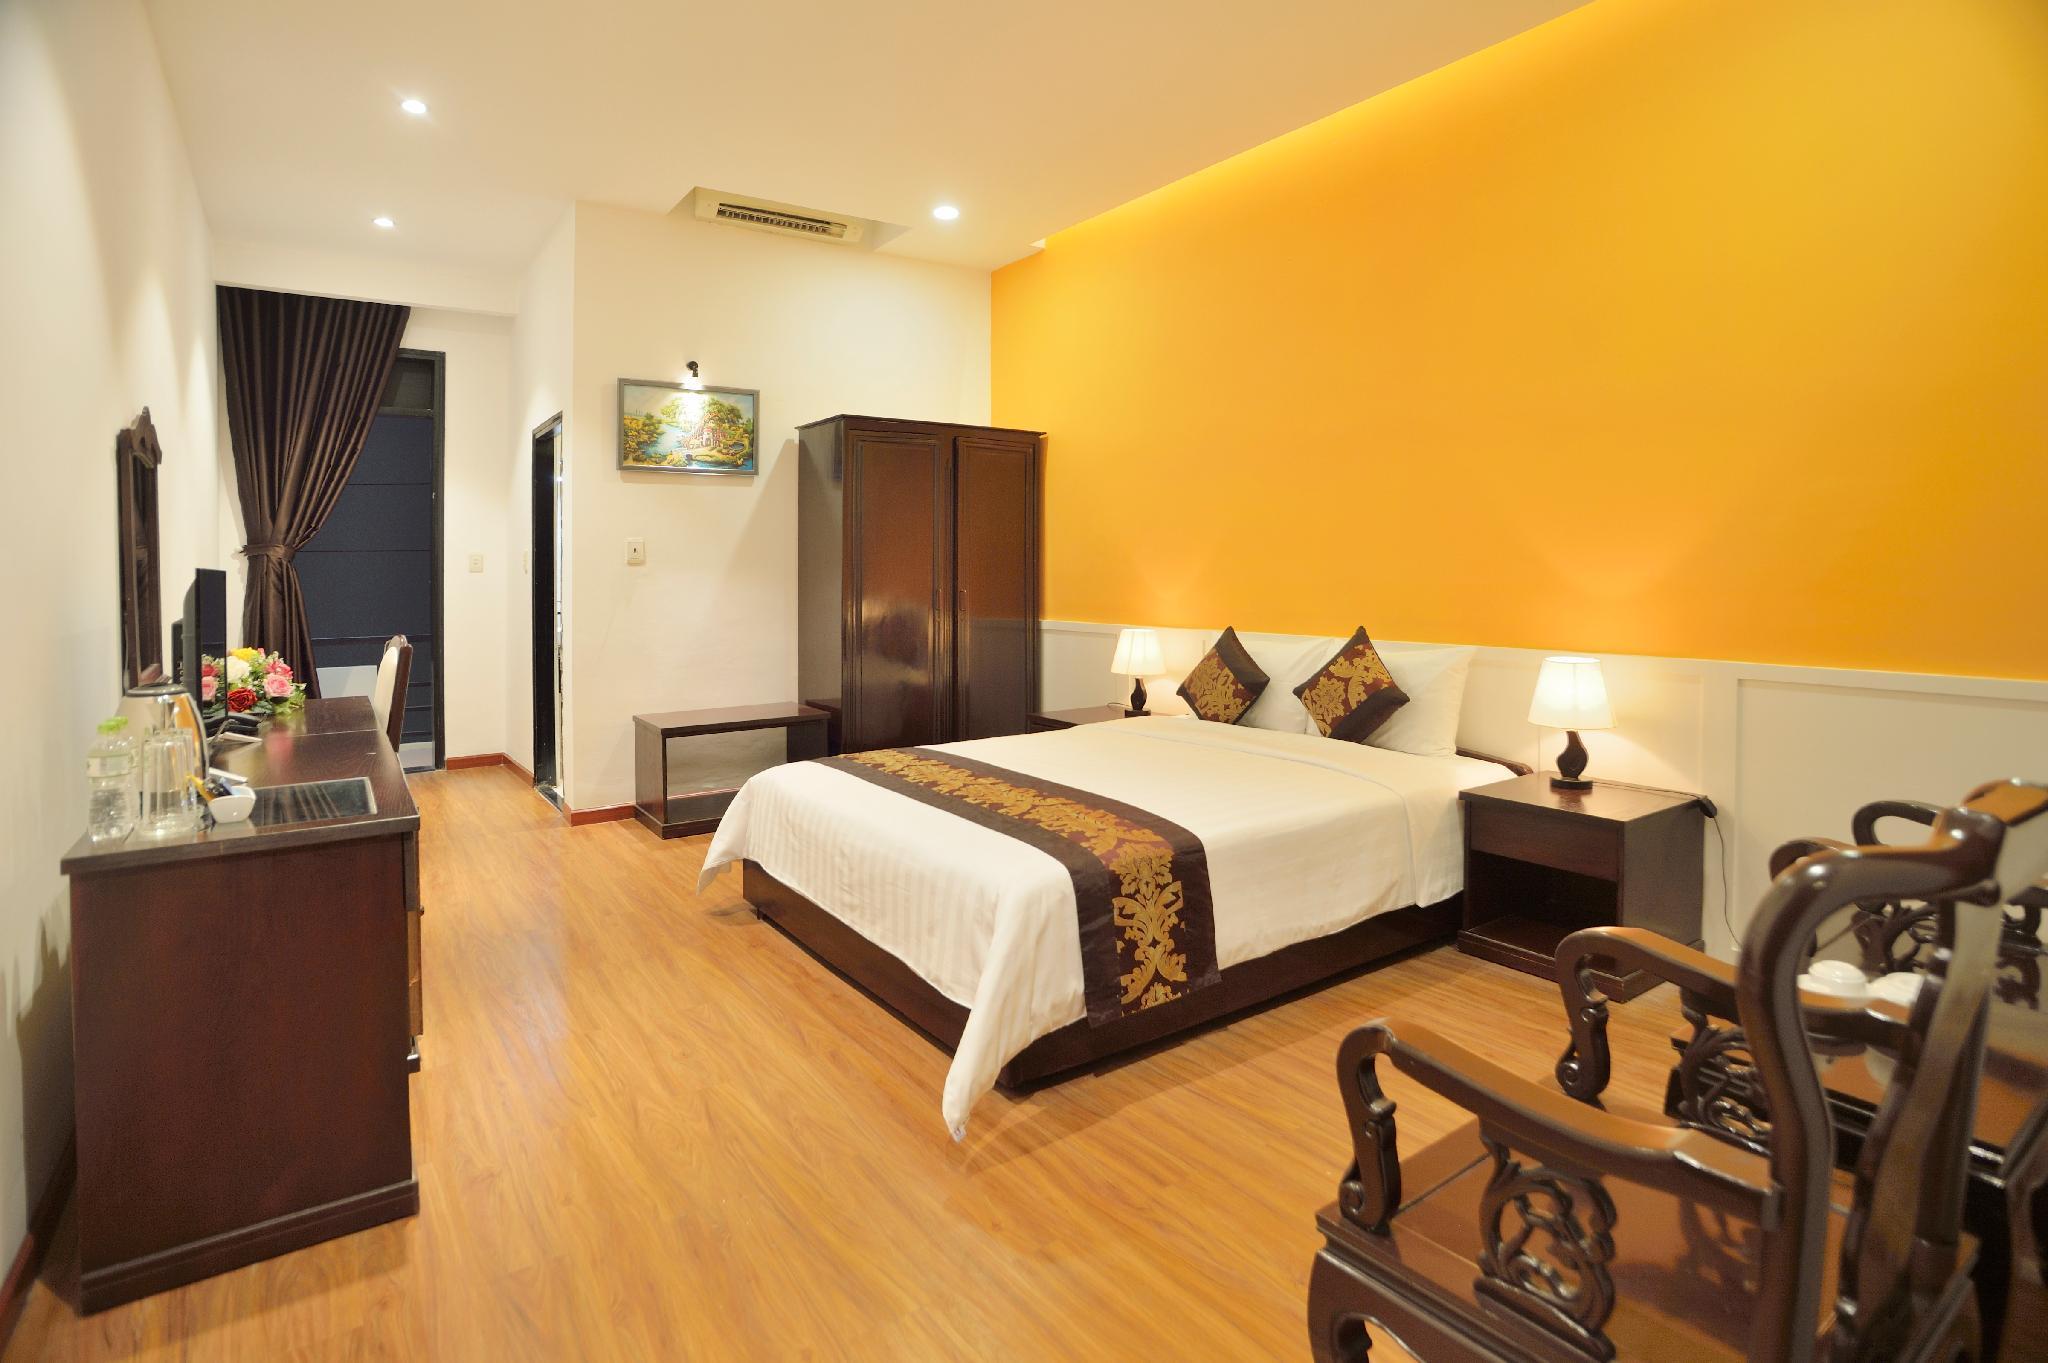 7S Hotel An Ph� Central